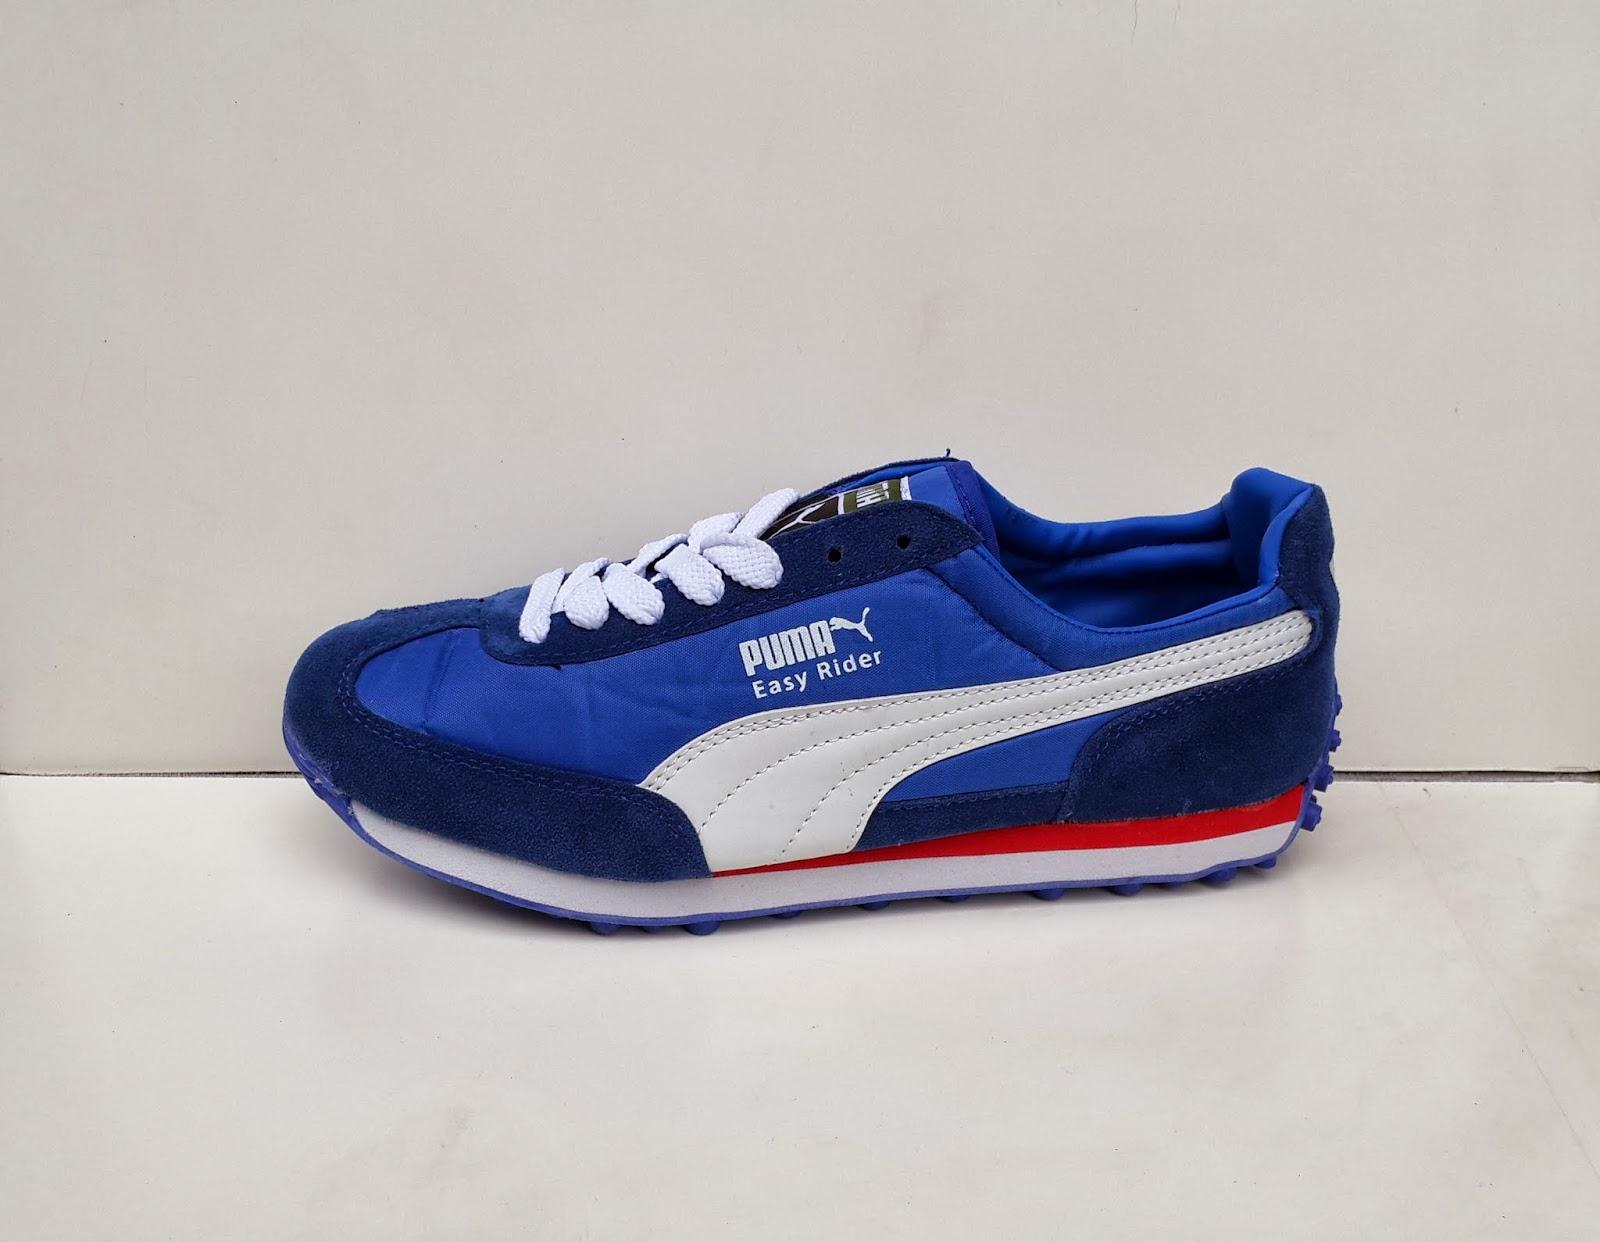 toko sepatu Puma Easy Rider, jual Sepatu Puma Easy Rider biru